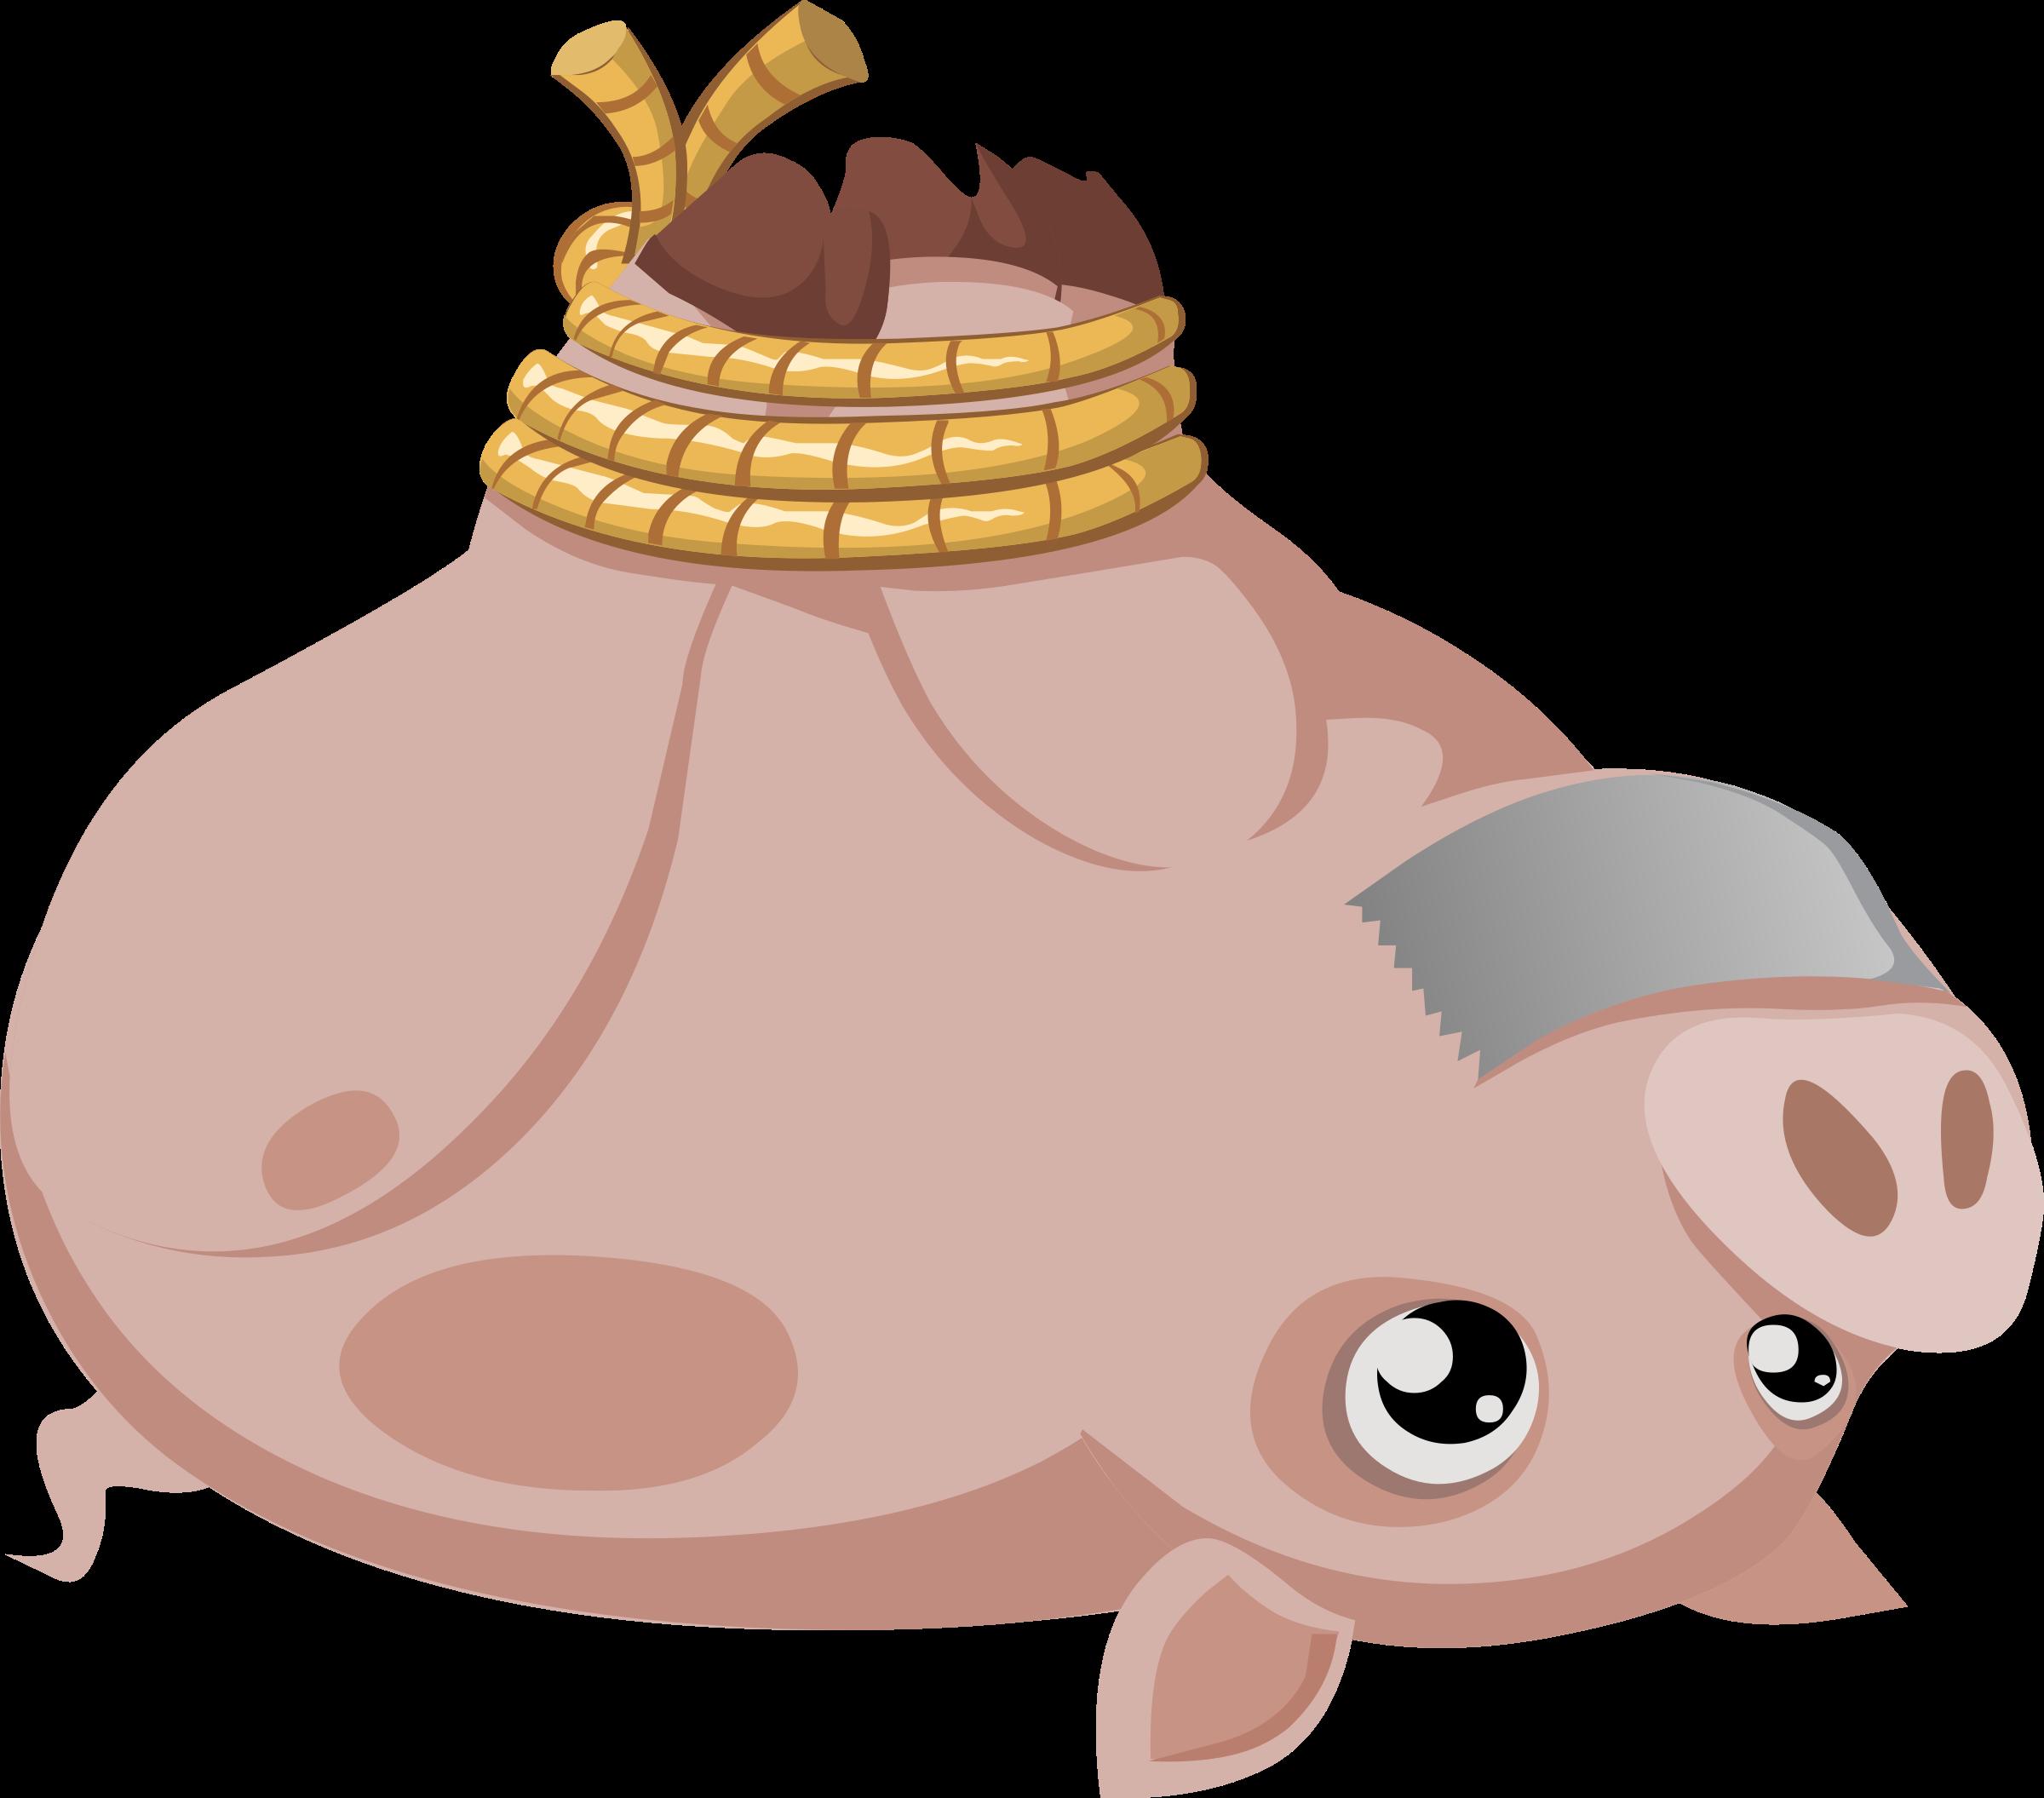 Walrus clipart svg. Misc hogtied piggy icons